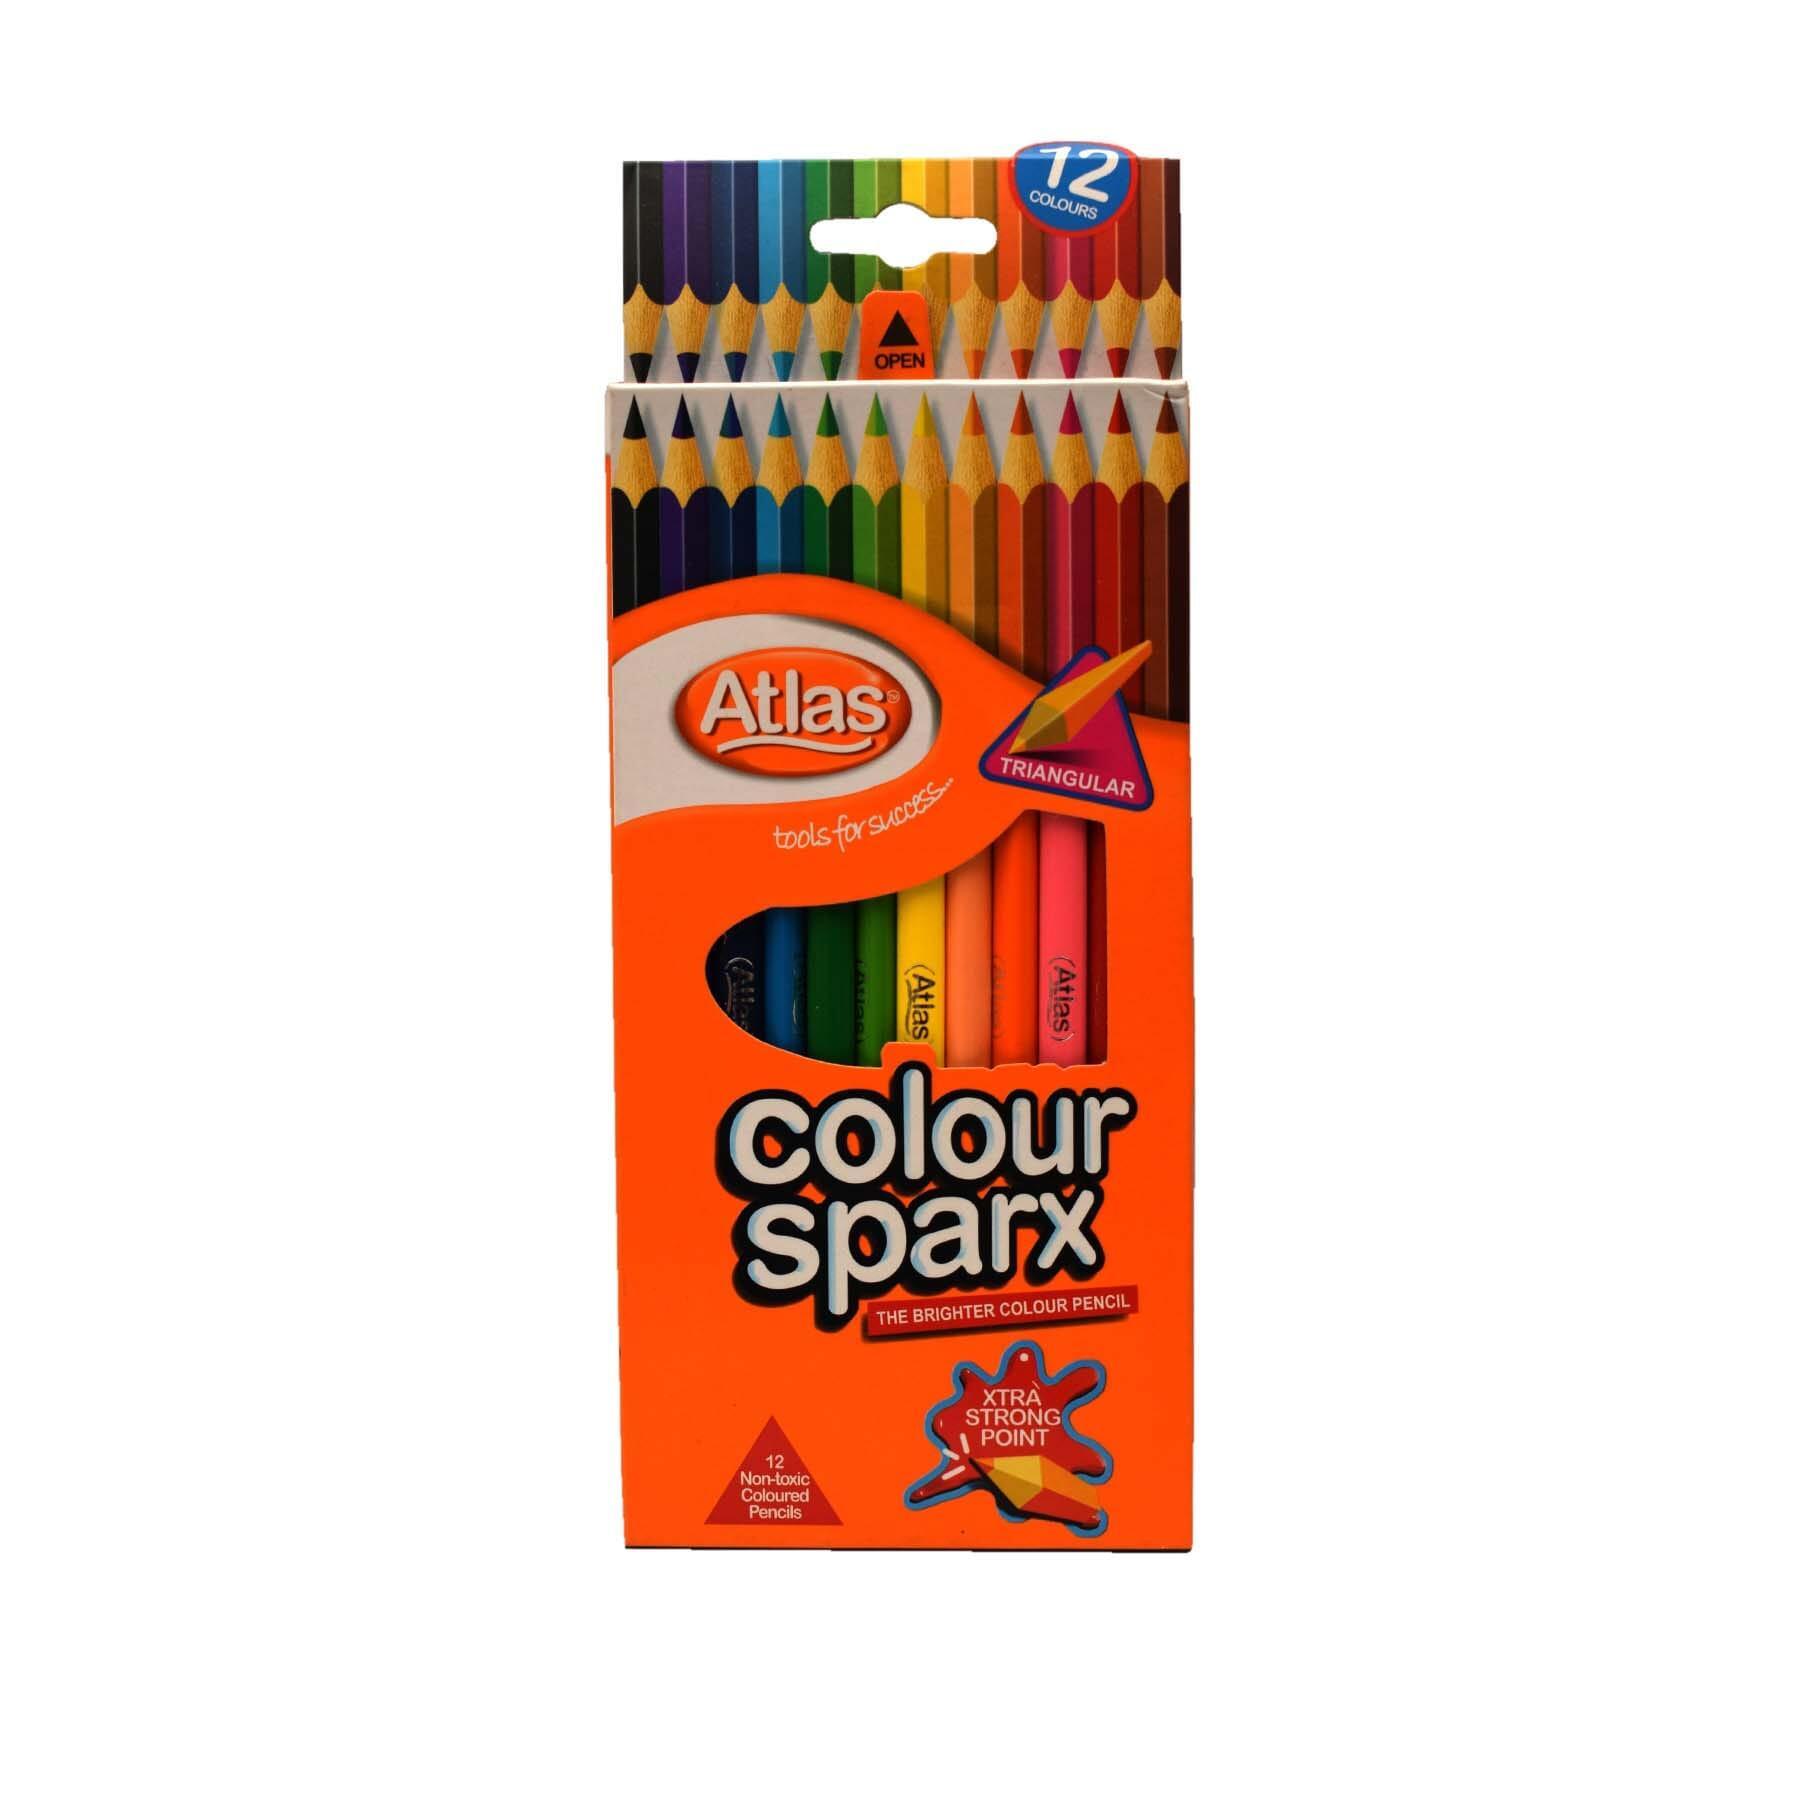 Atlas Colour Sprax - Multi Colour